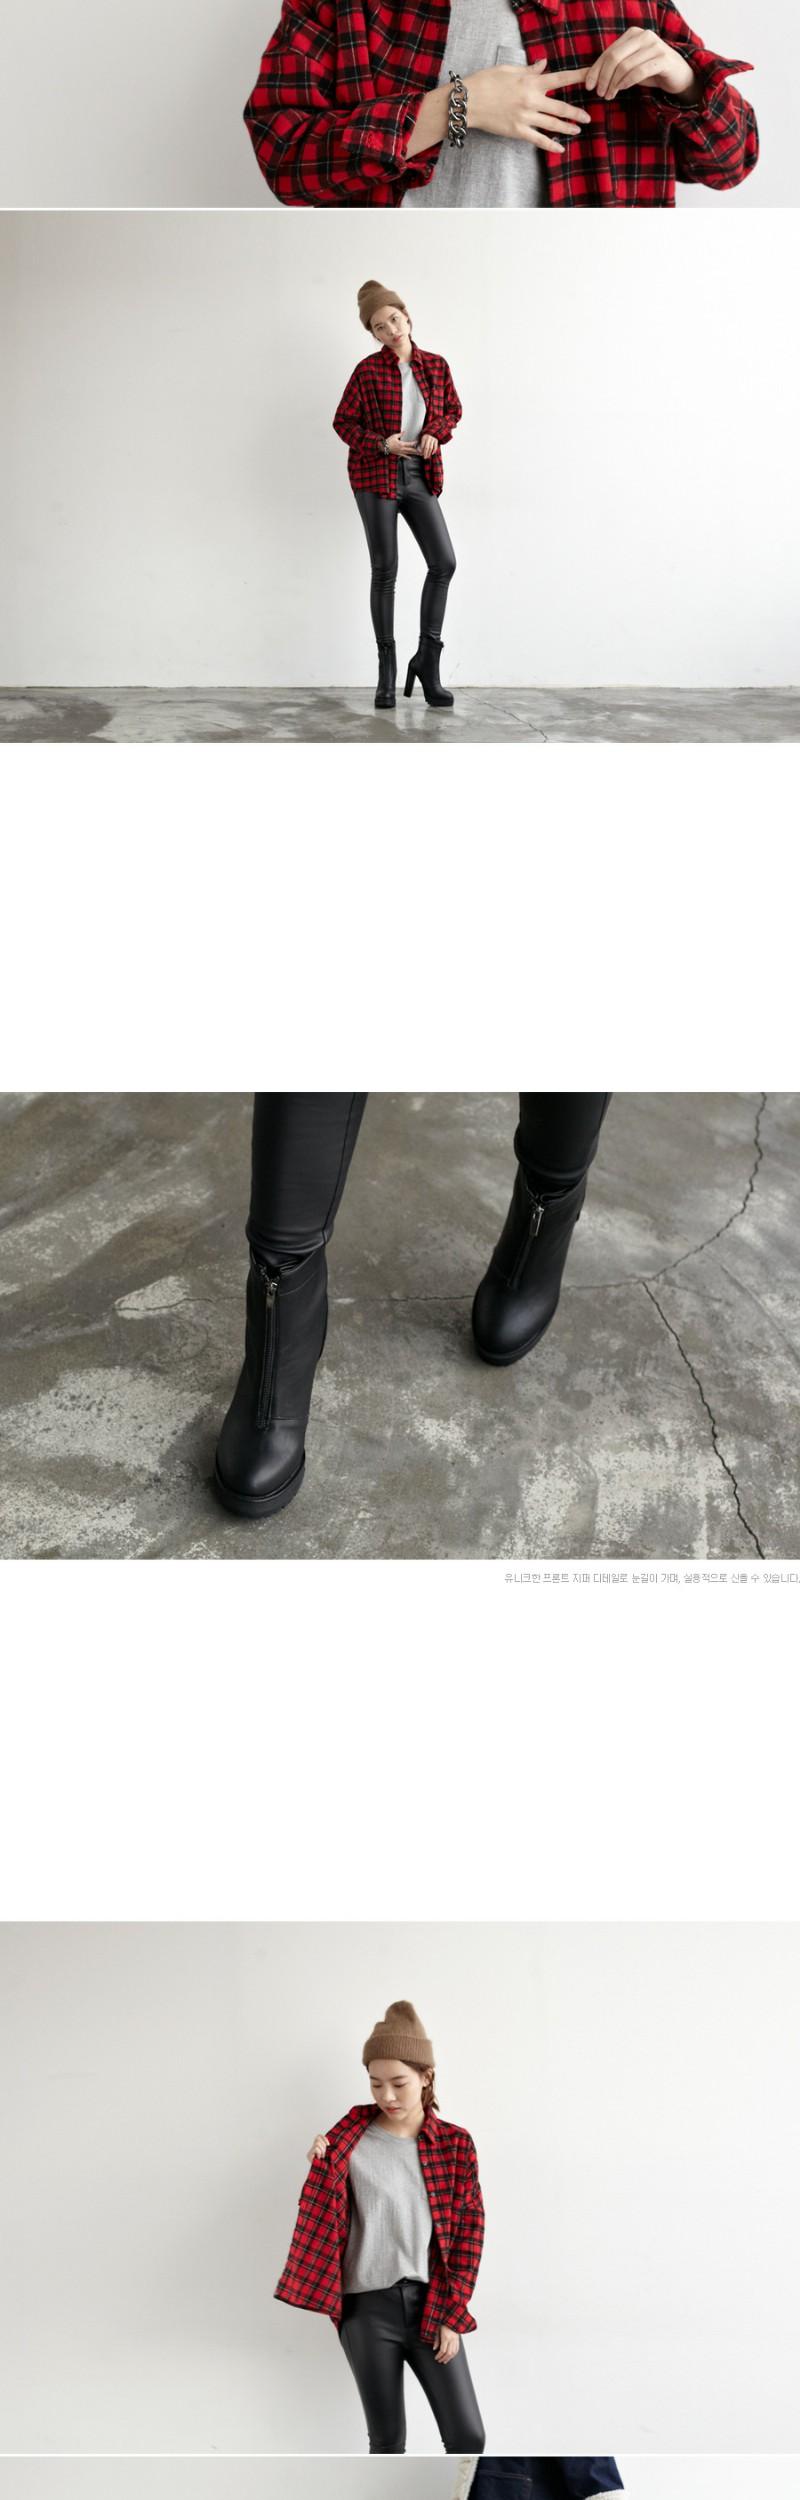 Middle_zipper platform boots